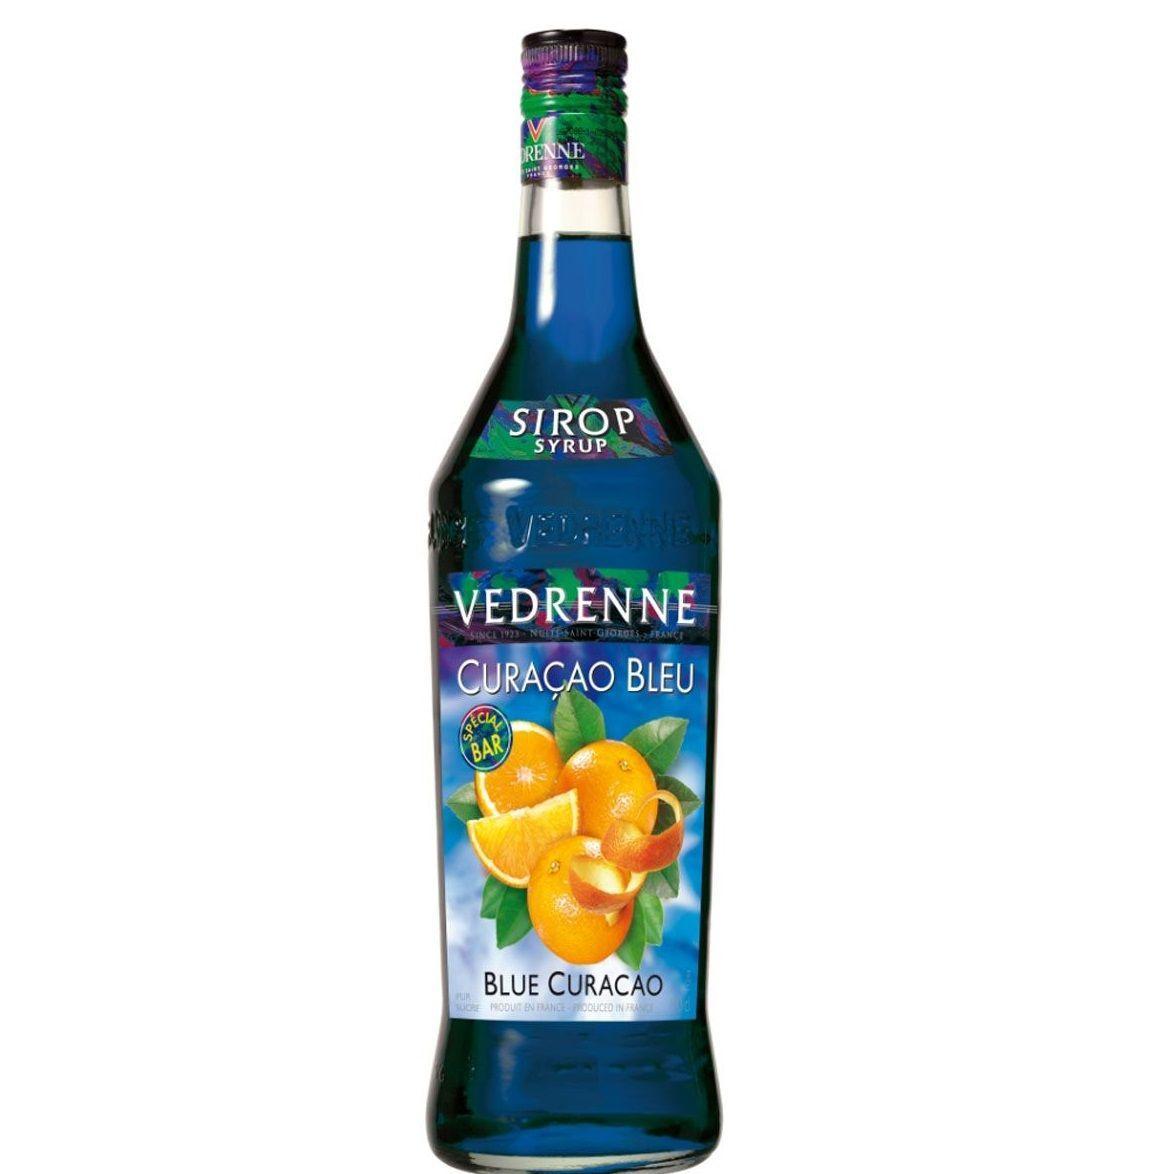 Сироп Vedrenne Curacao Bleu